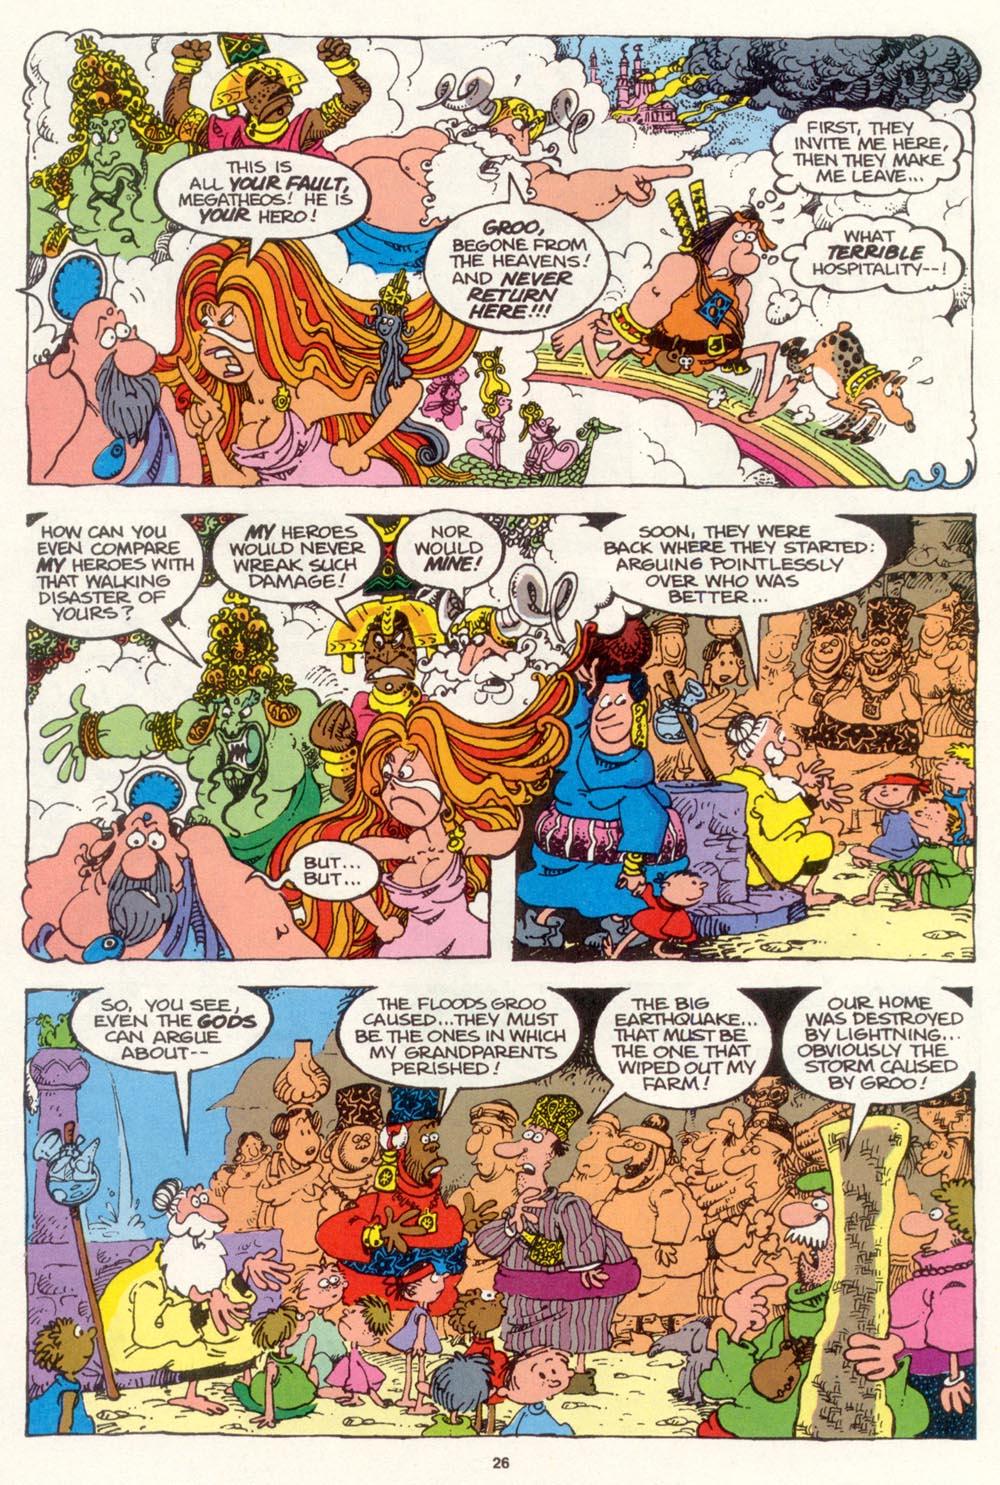 Read online Sergio Aragonés Groo the Wanderer comic -  Issue #99 - 27